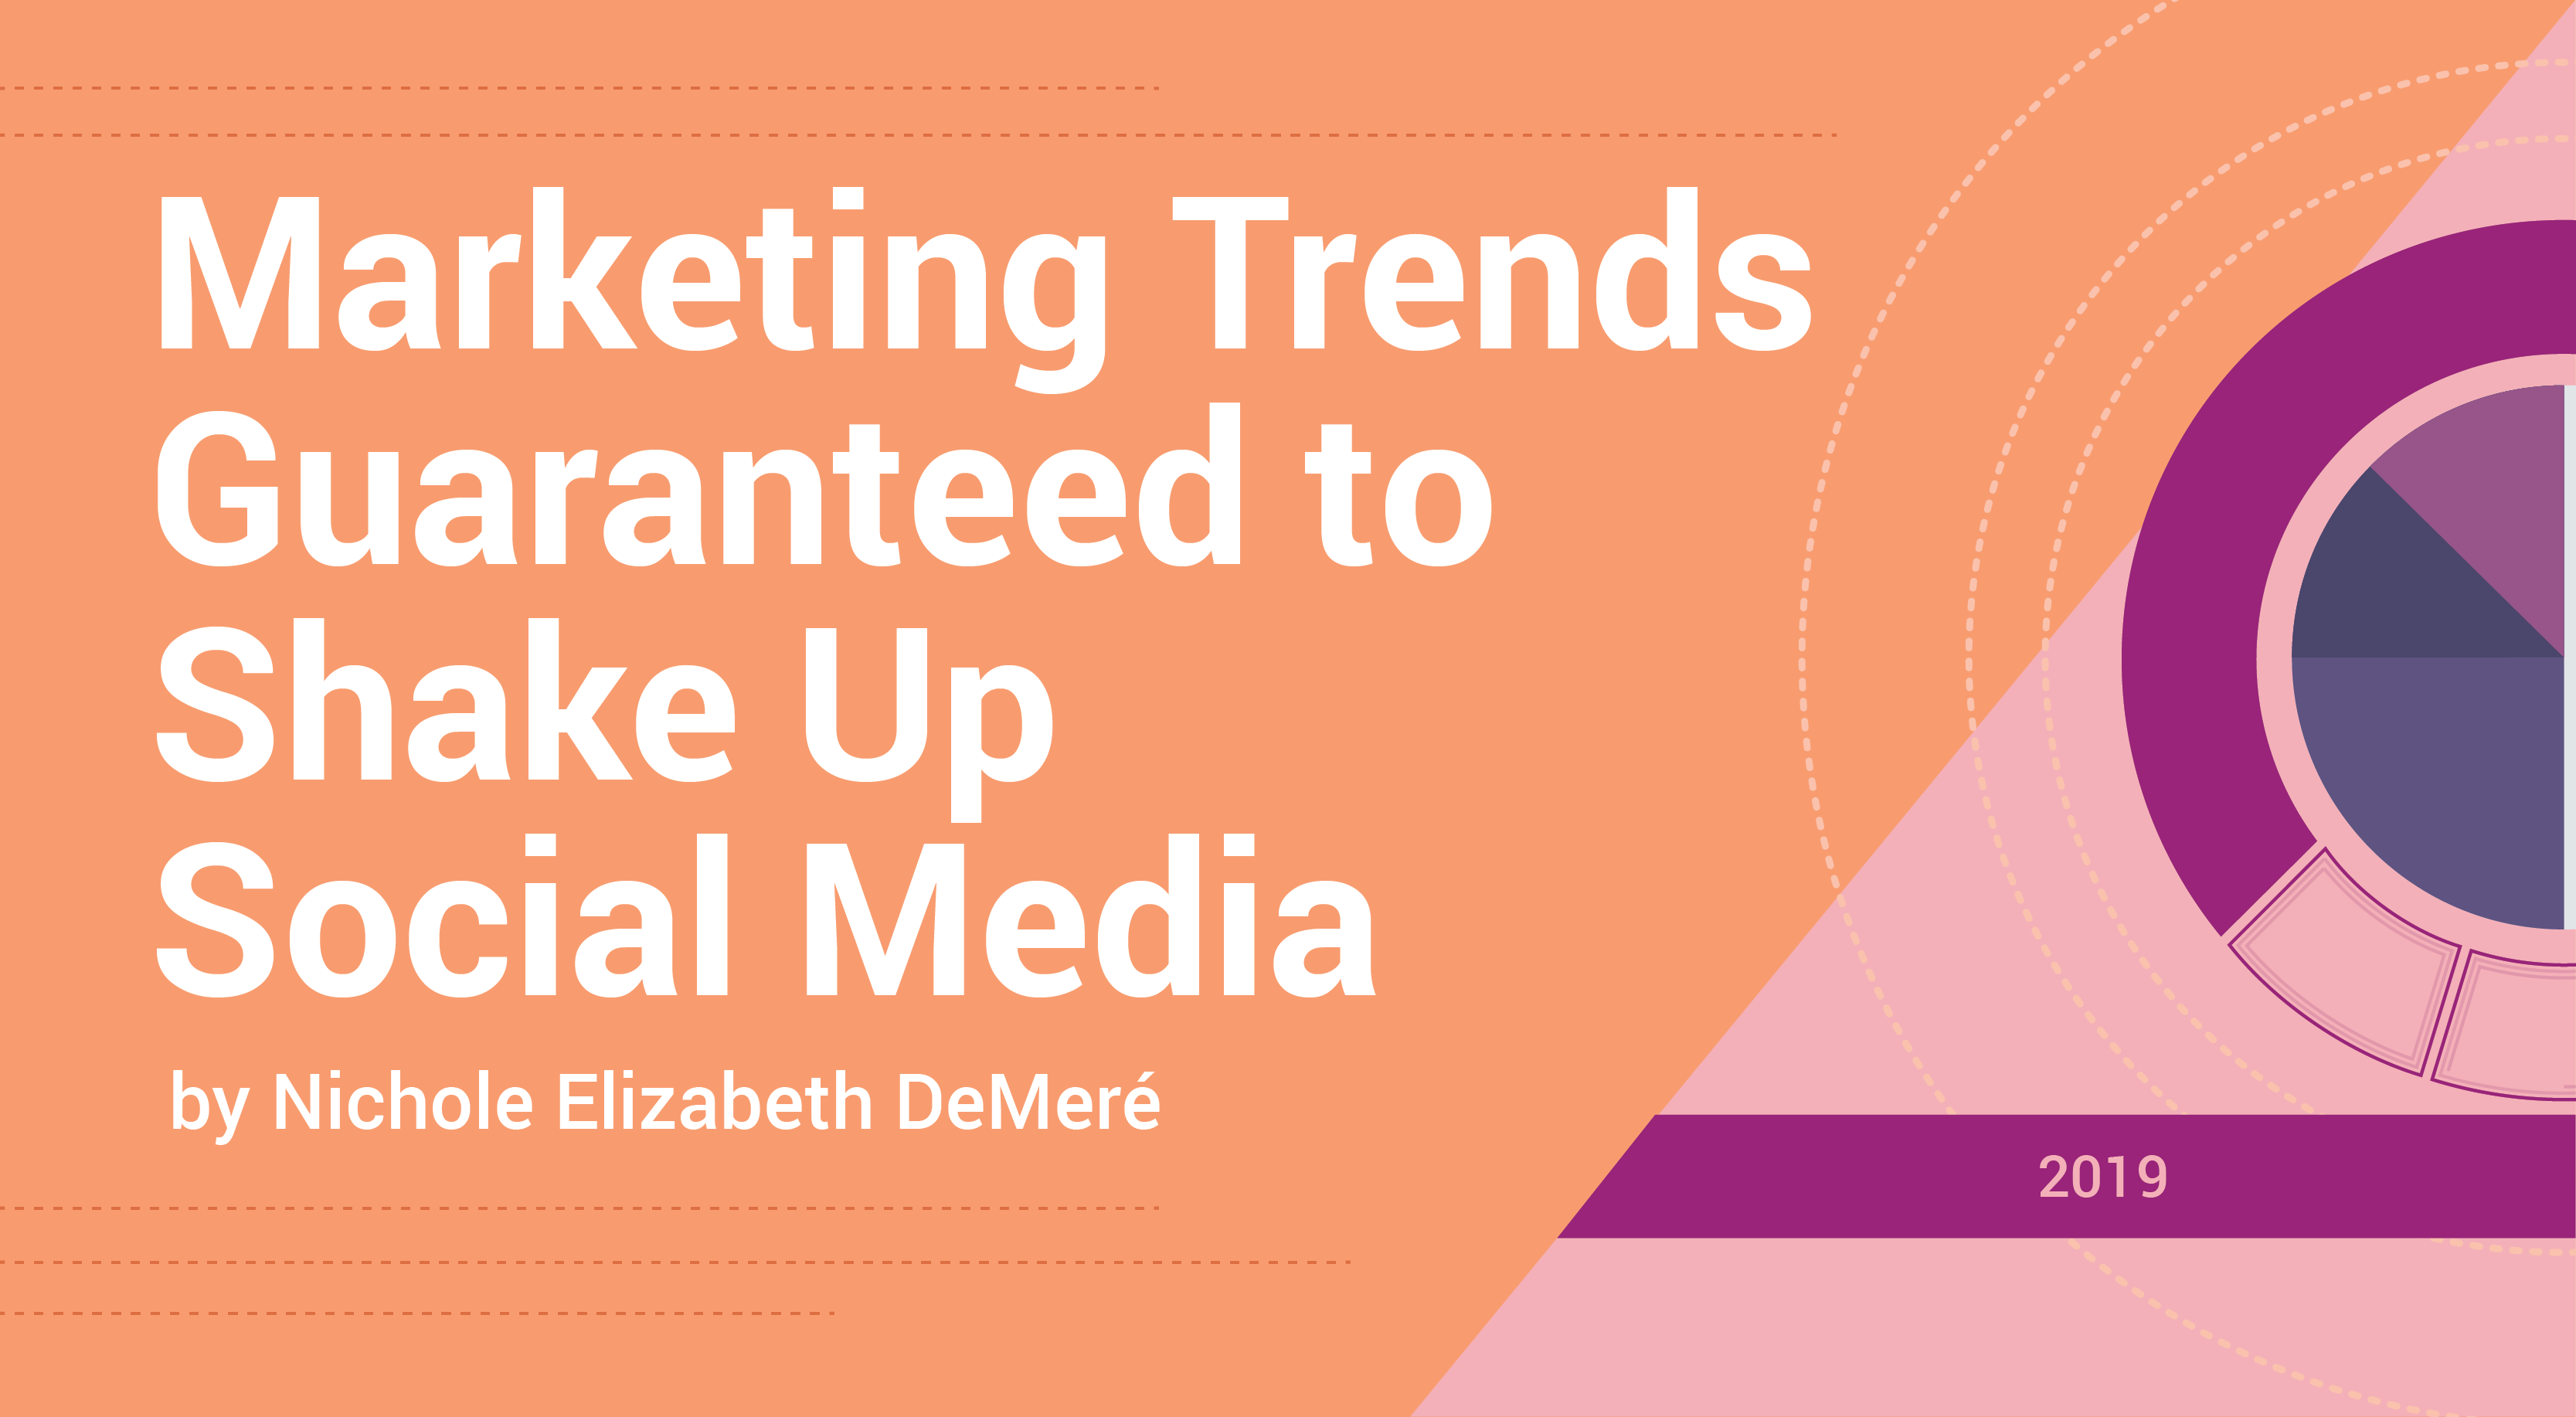 2019 Marketing Trends Guaranteed to Shake Up Social Media